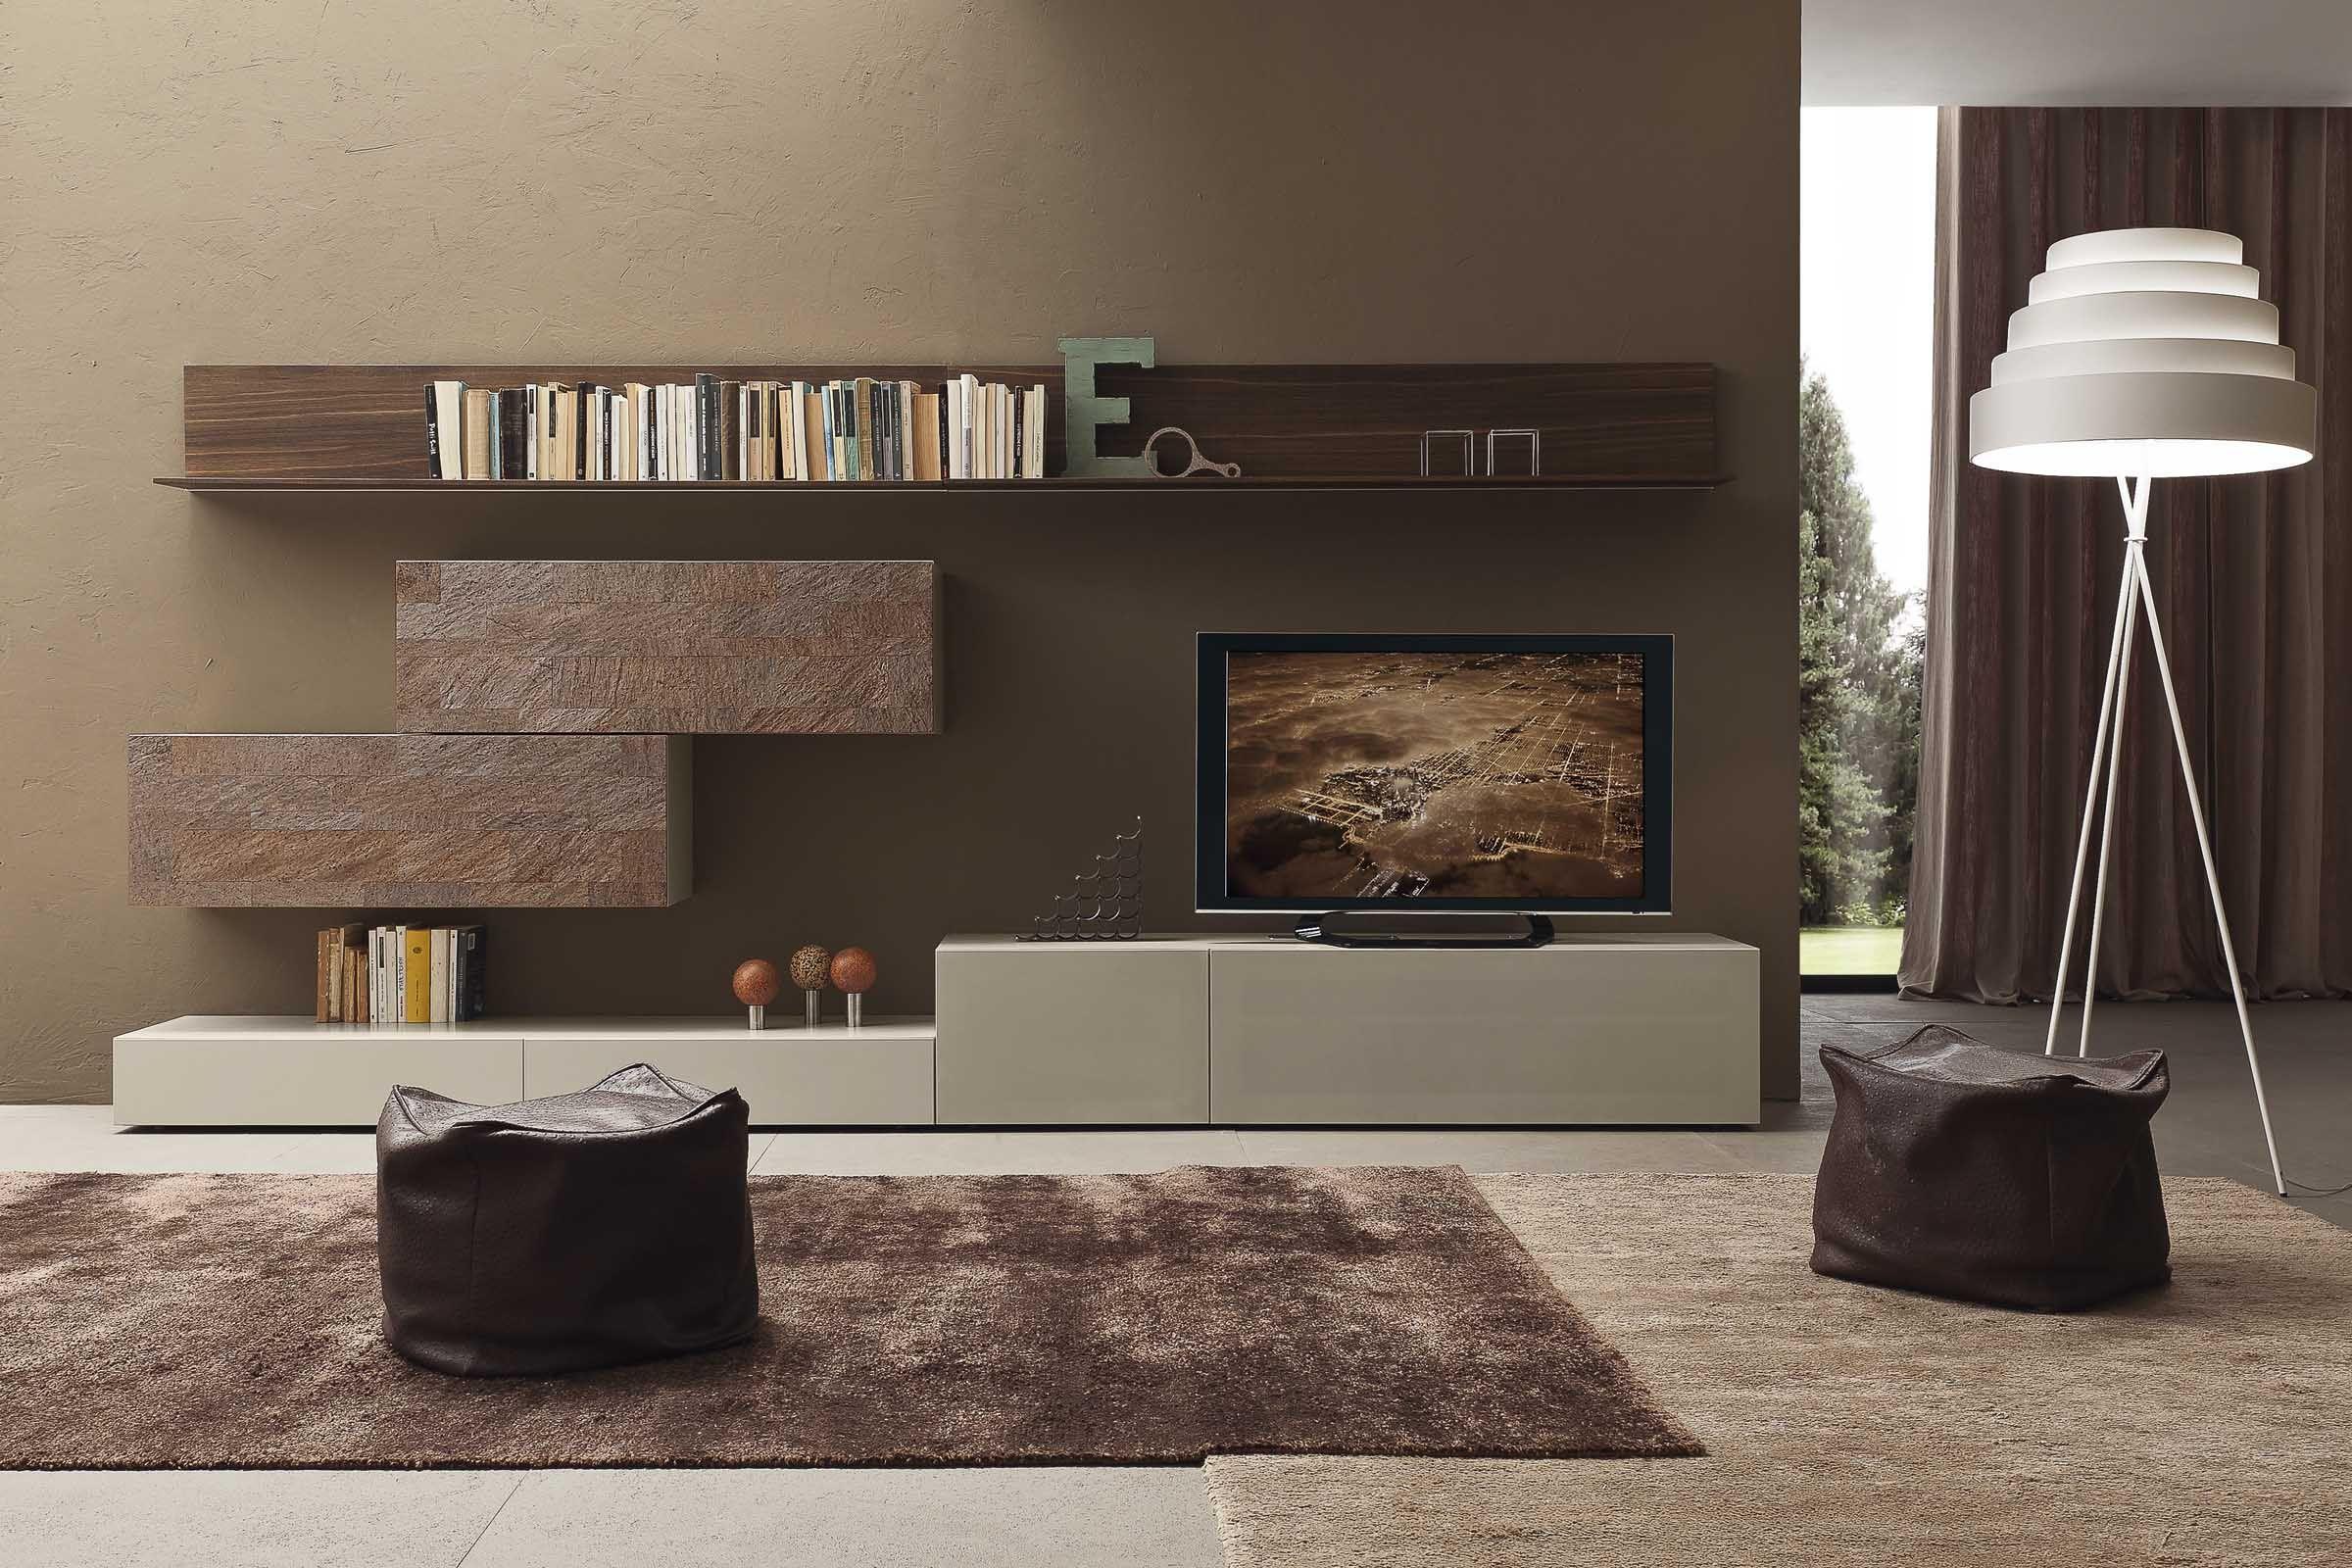 Angolo Tv Moderno pin di forever yong su studioroom | arredamento parete